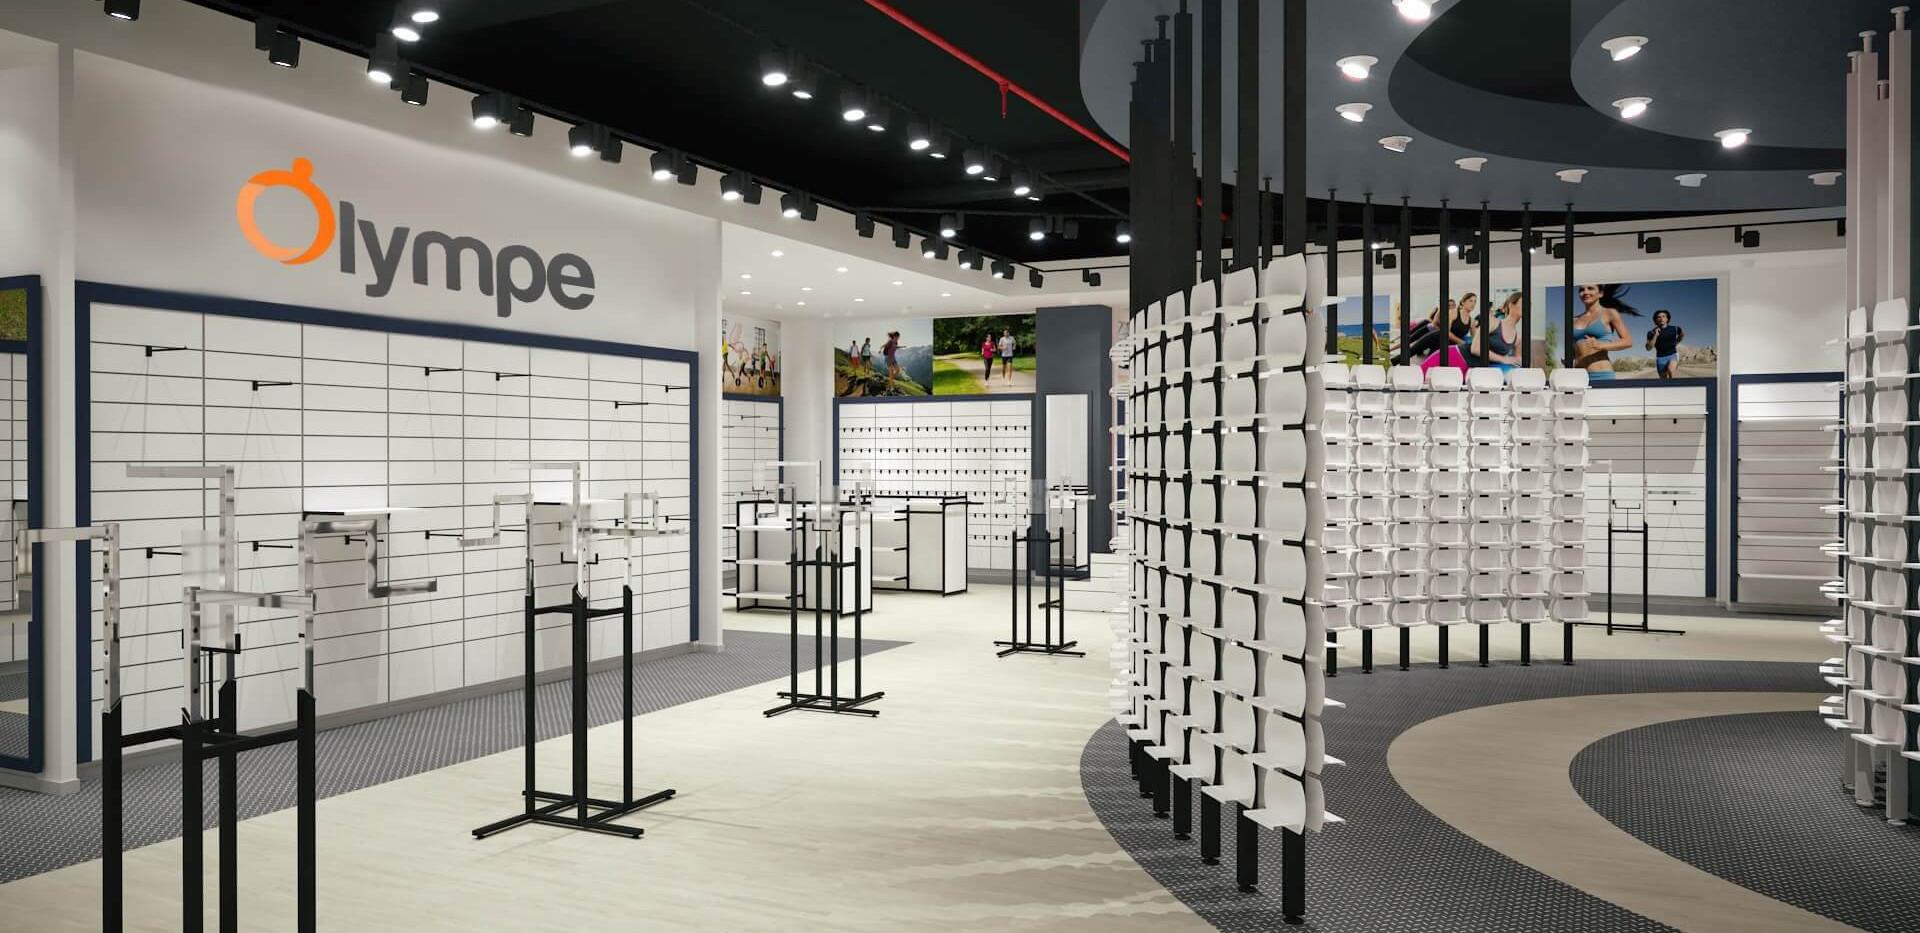 Olympe - Sports Store Shop Design-3.jpg